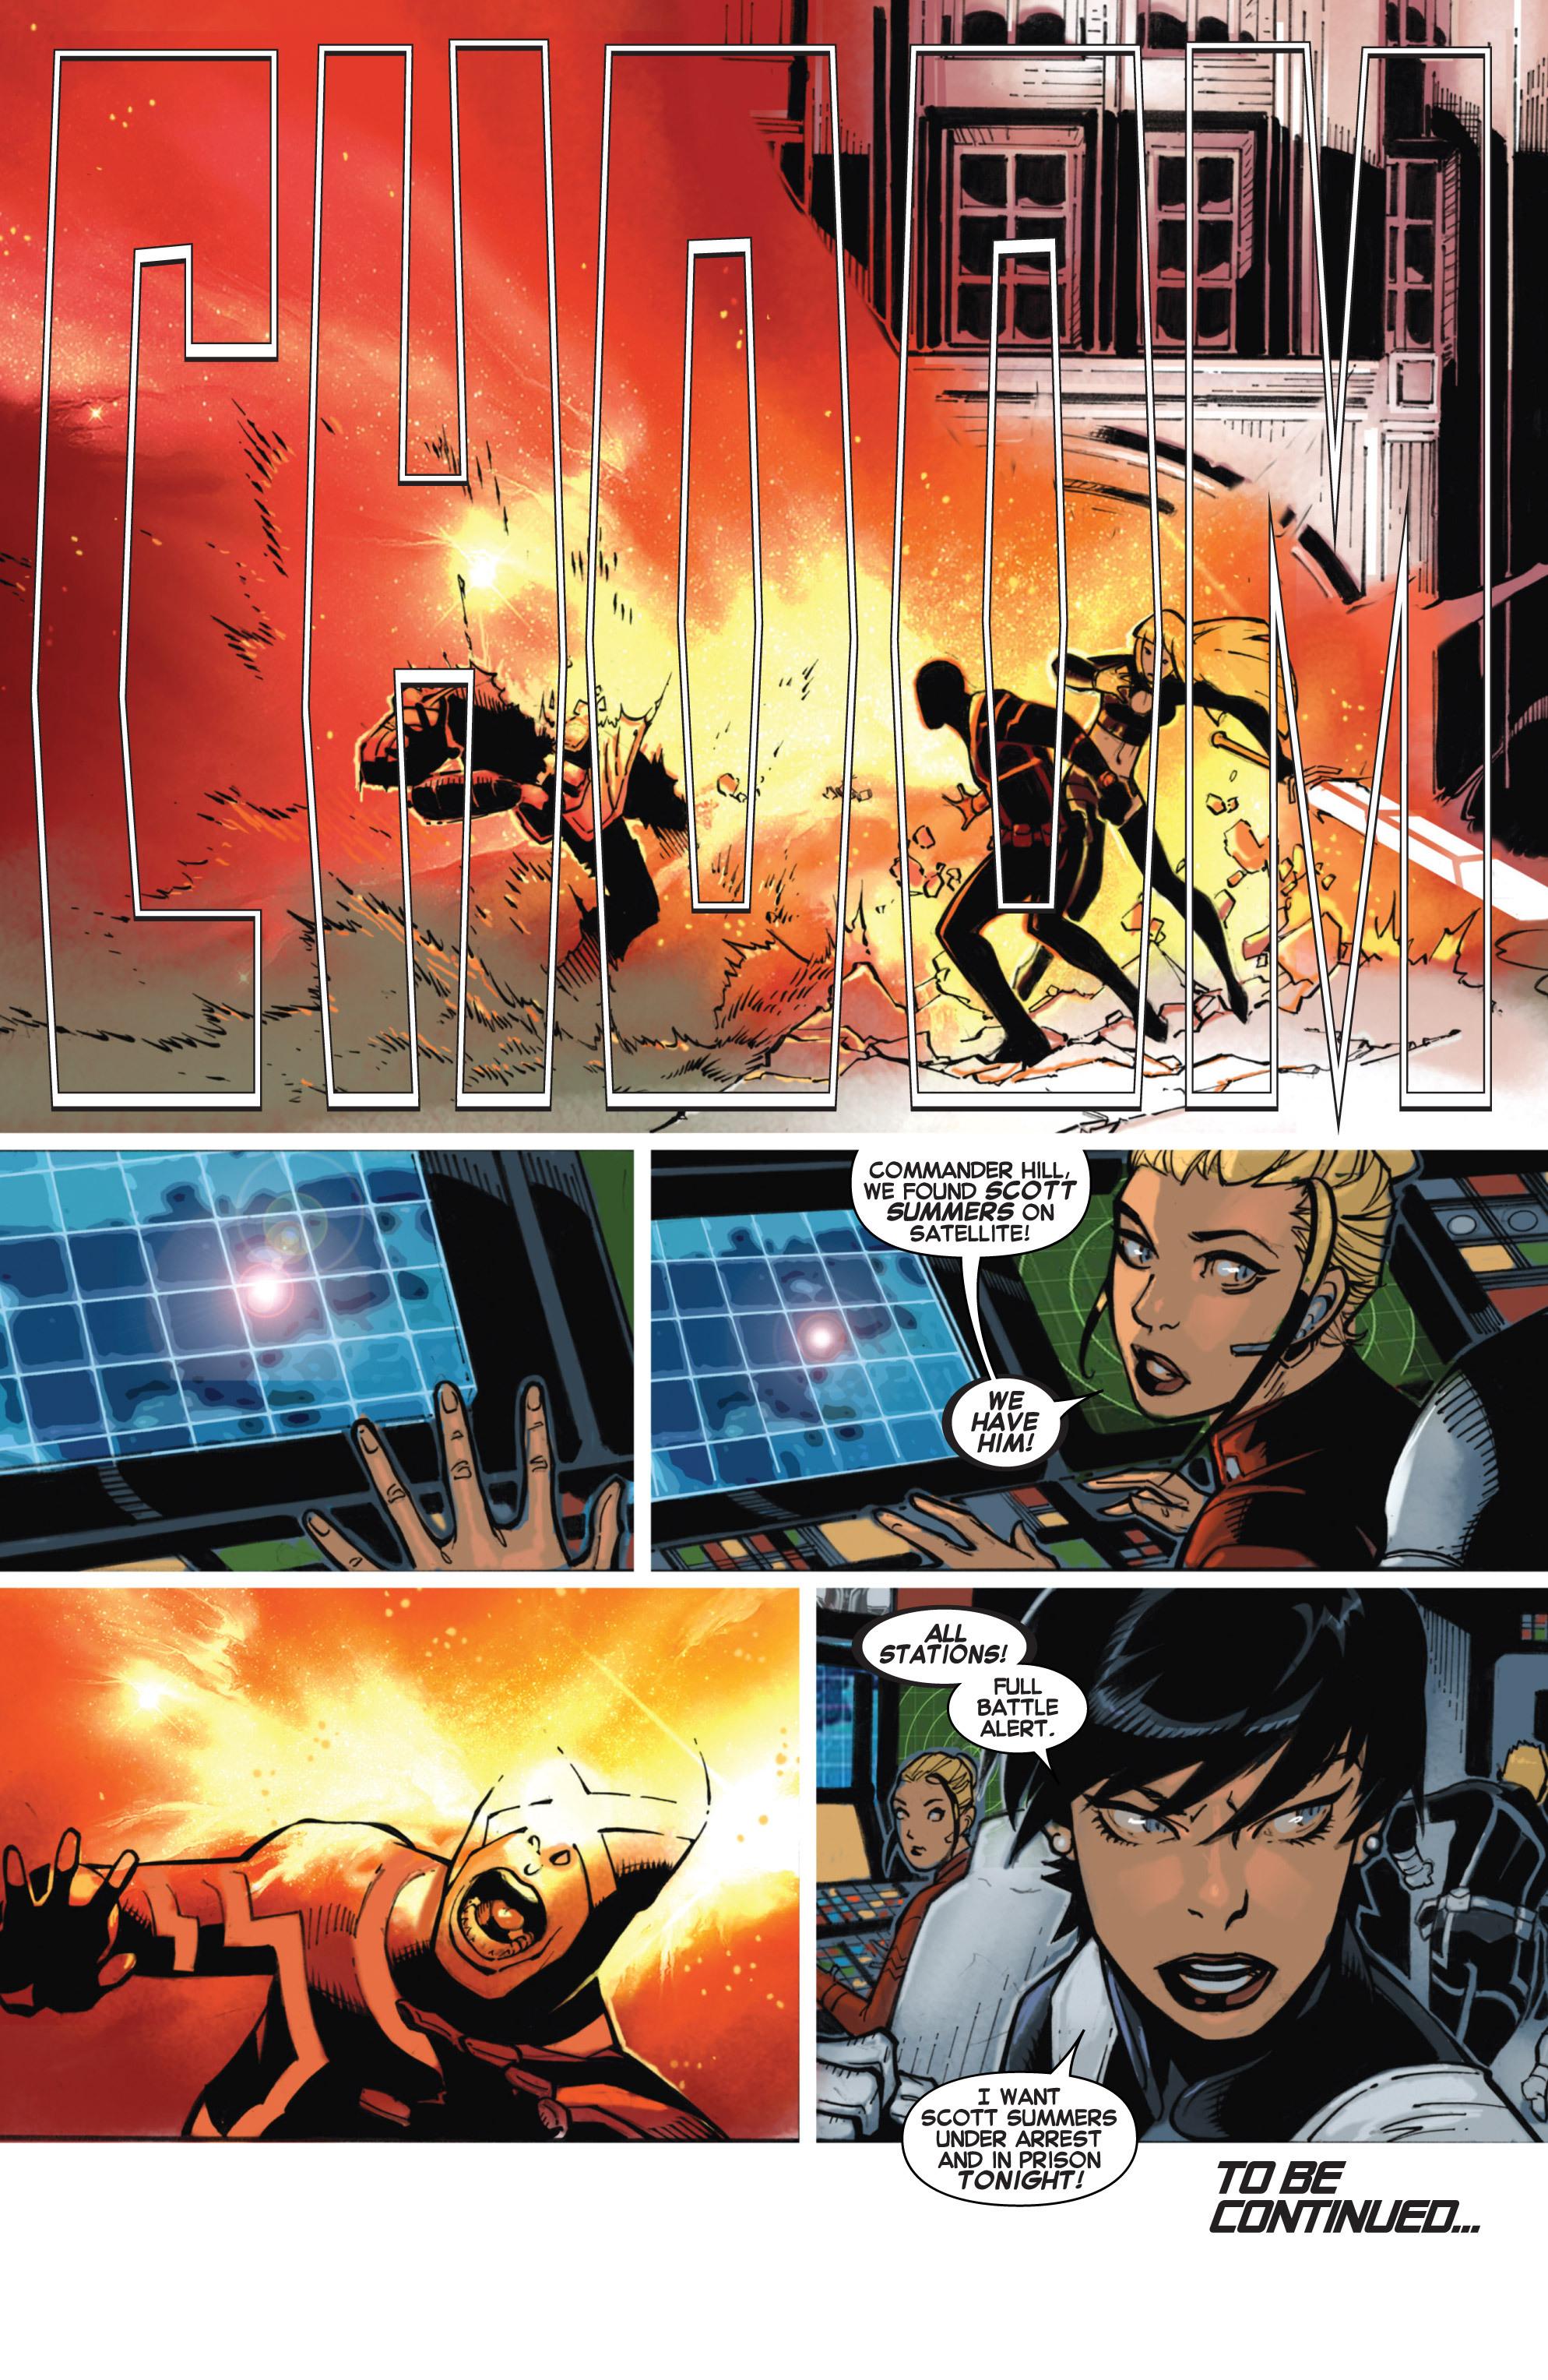 Read online Uncanny X-Men (2013) comic -  Issue # _TPB 4 - vs. S.H.I.E.L.D - 41